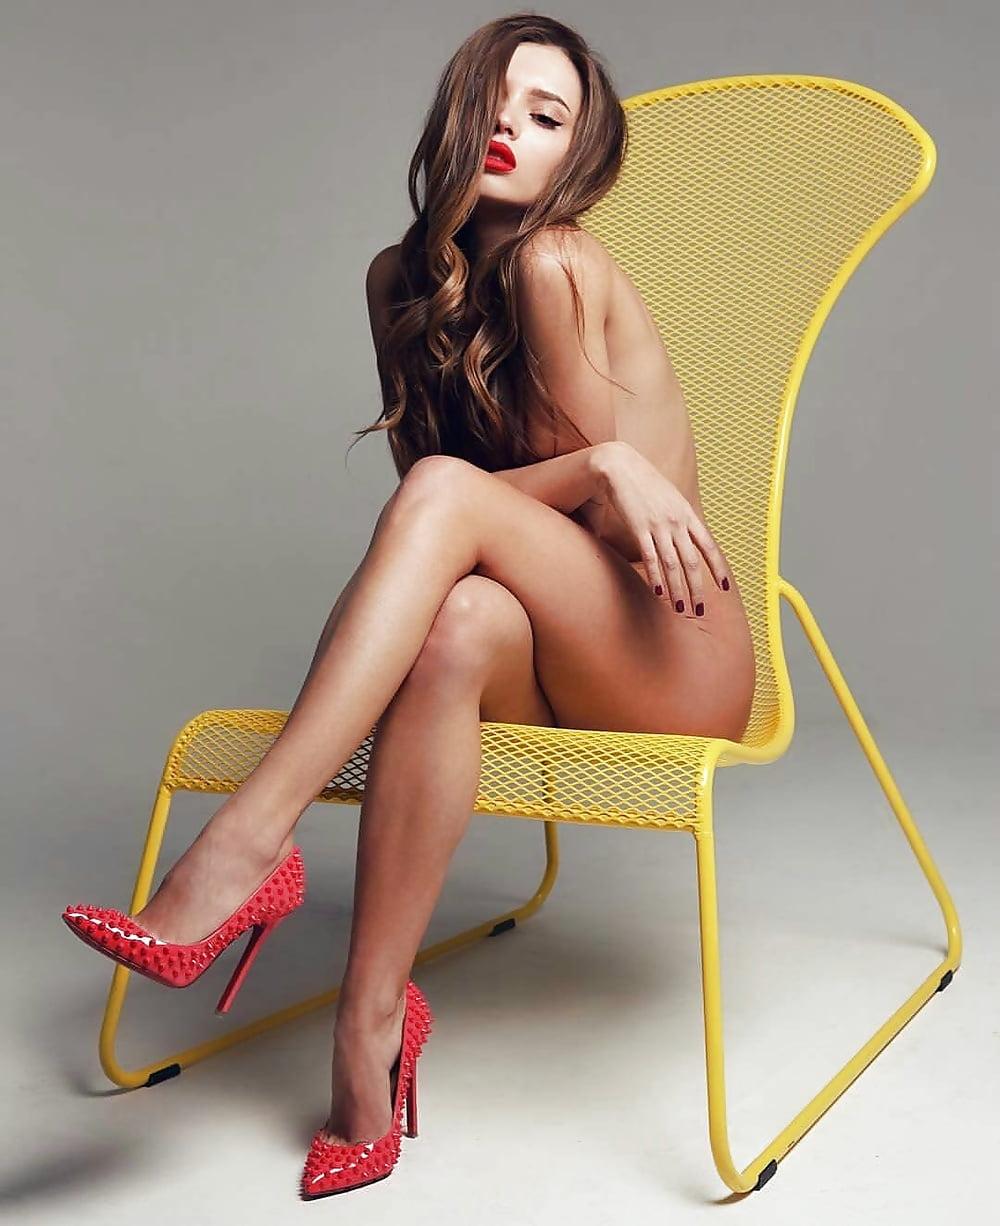 Hot naked women in heels